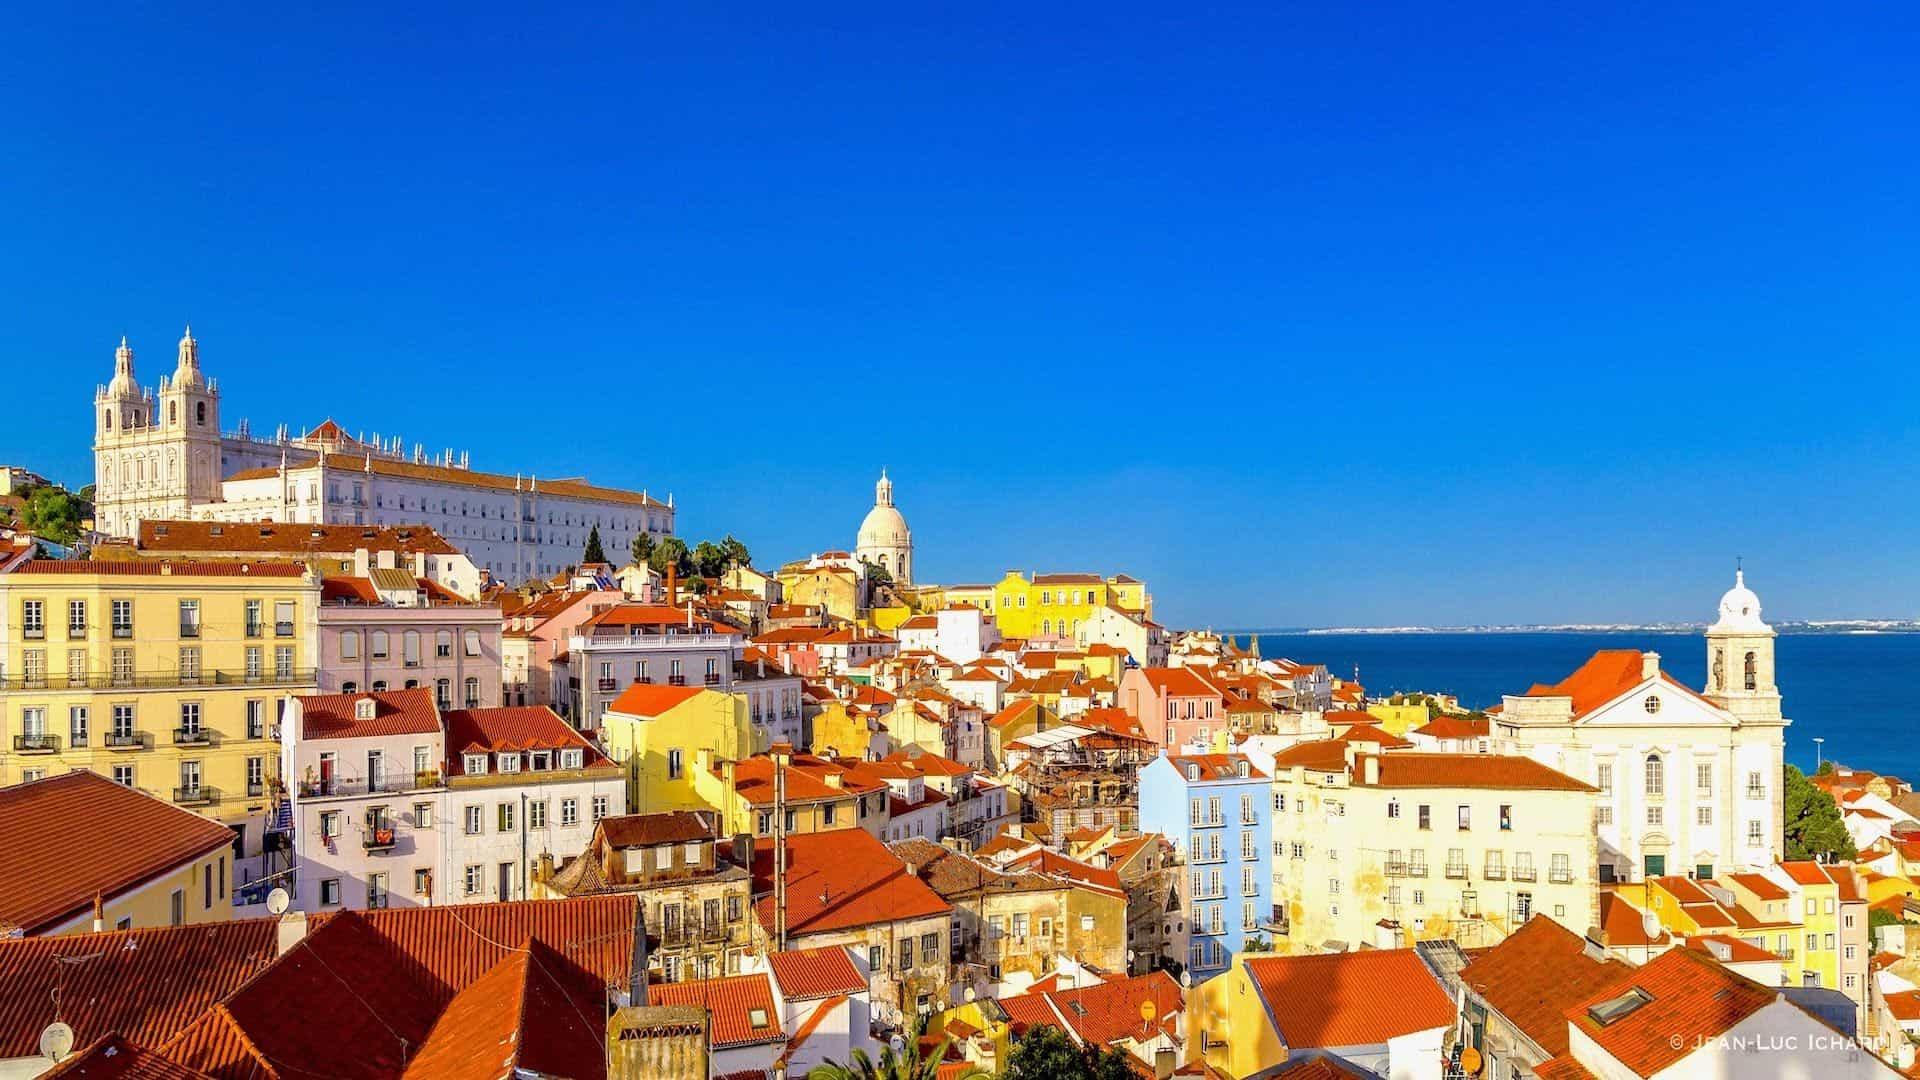 Lisbone etudie de sante